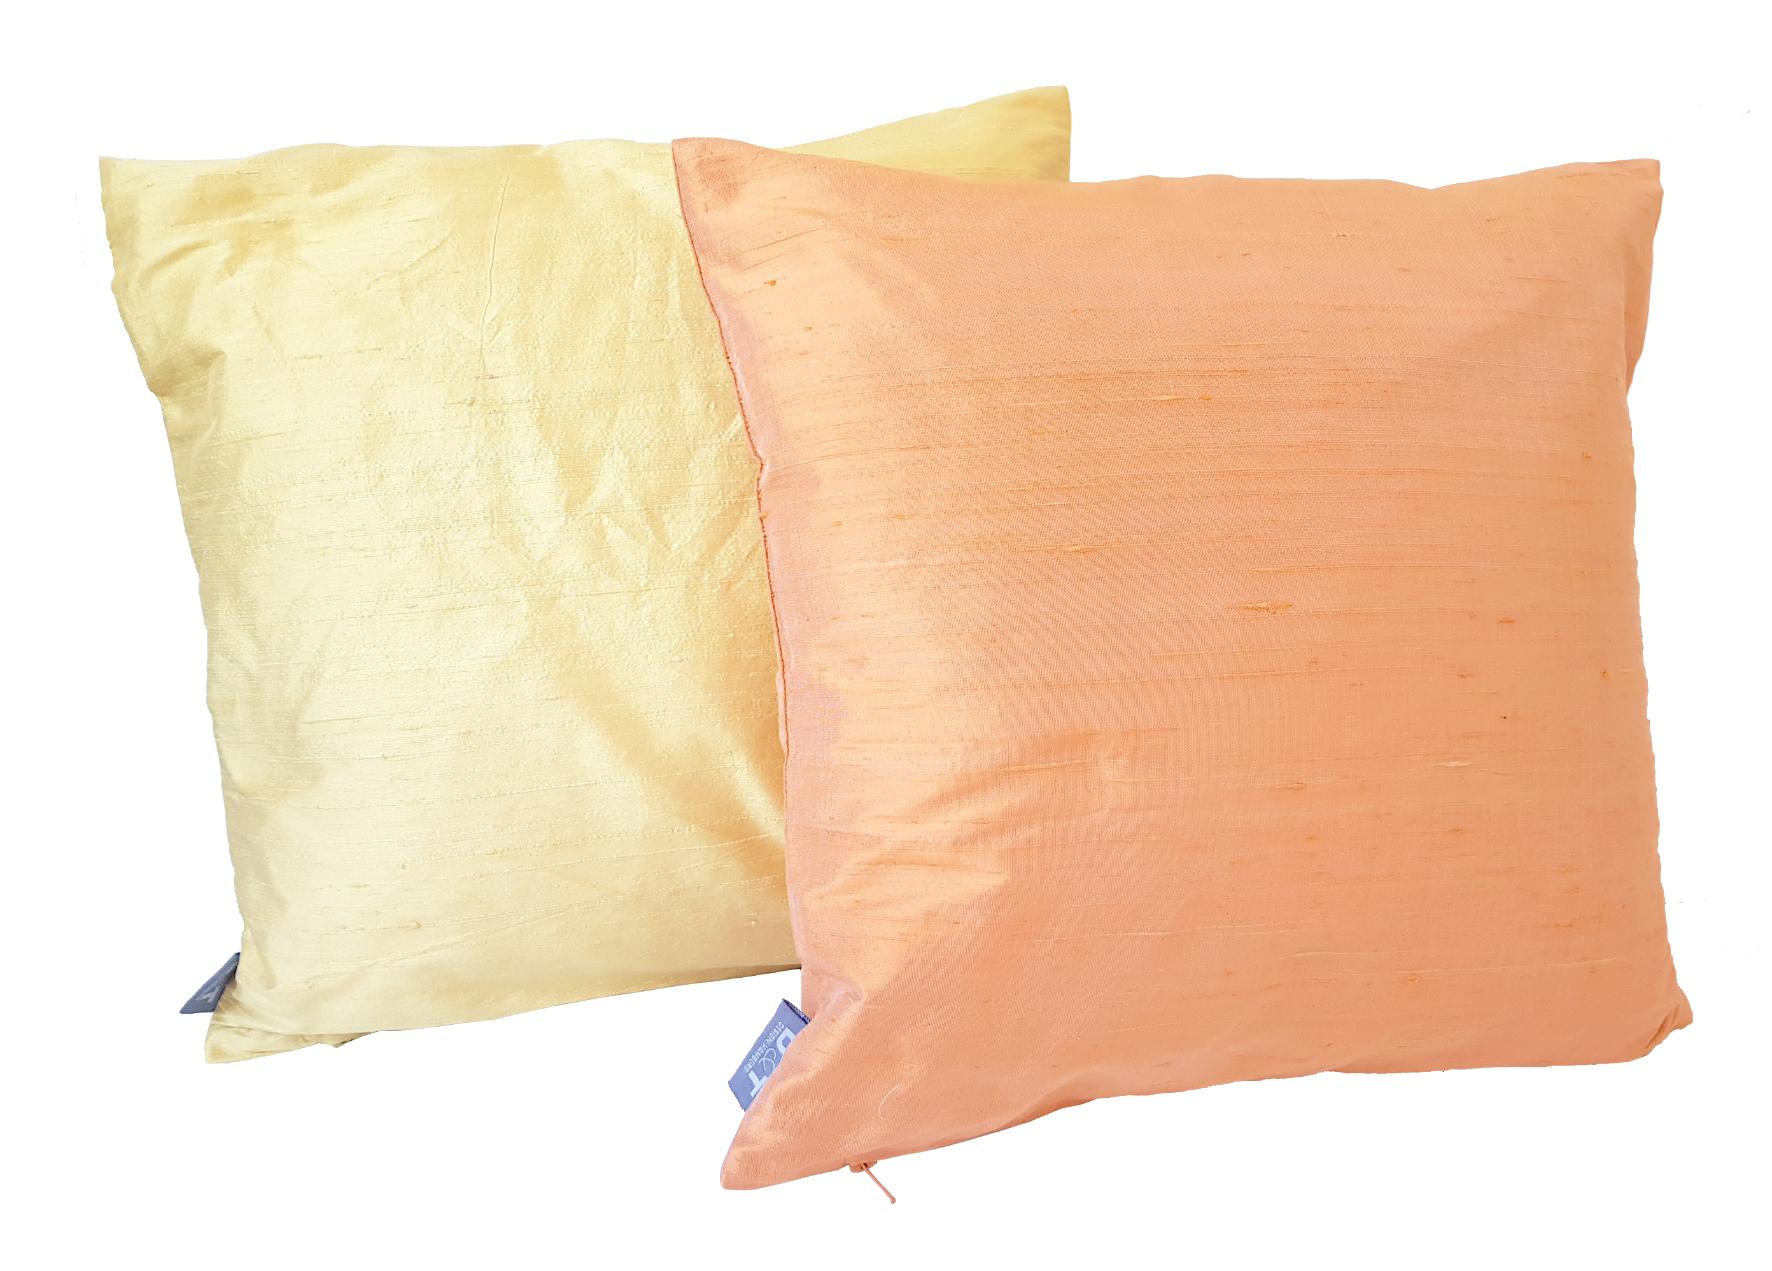 Farbvergleich Maisgelb & Mandarin